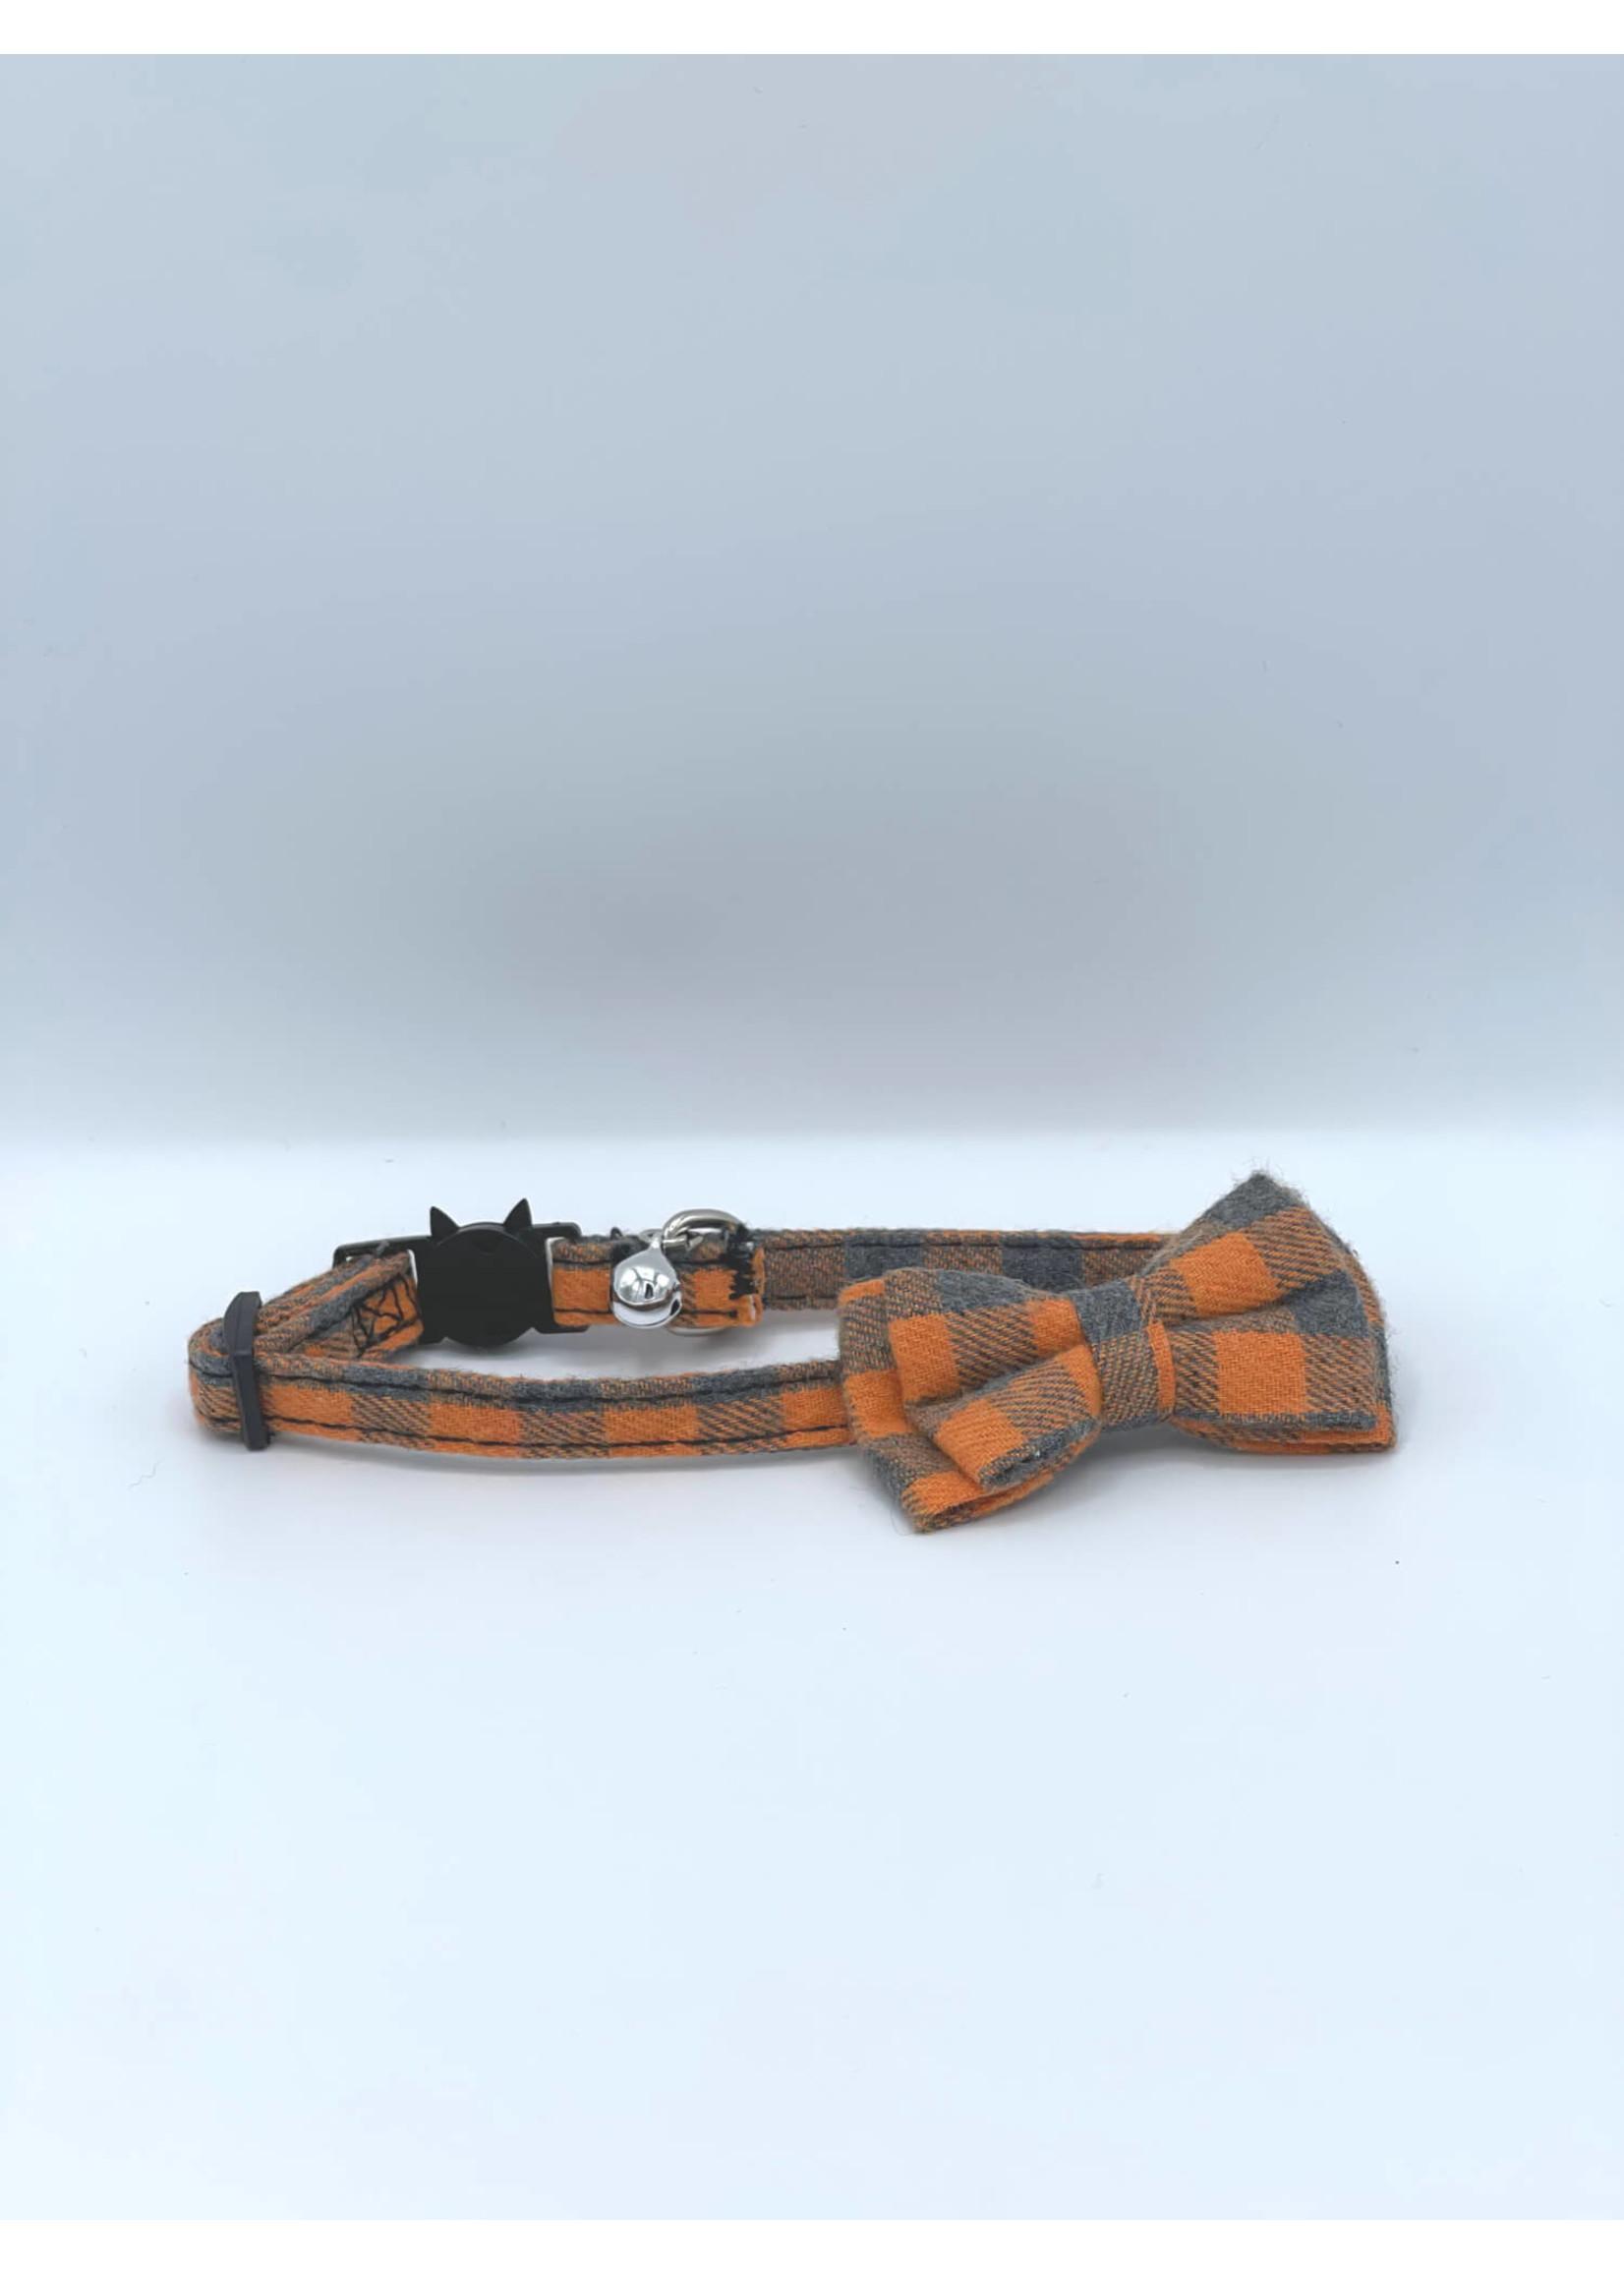 Cat Bow Tie Collar w/ Bell, Plaid